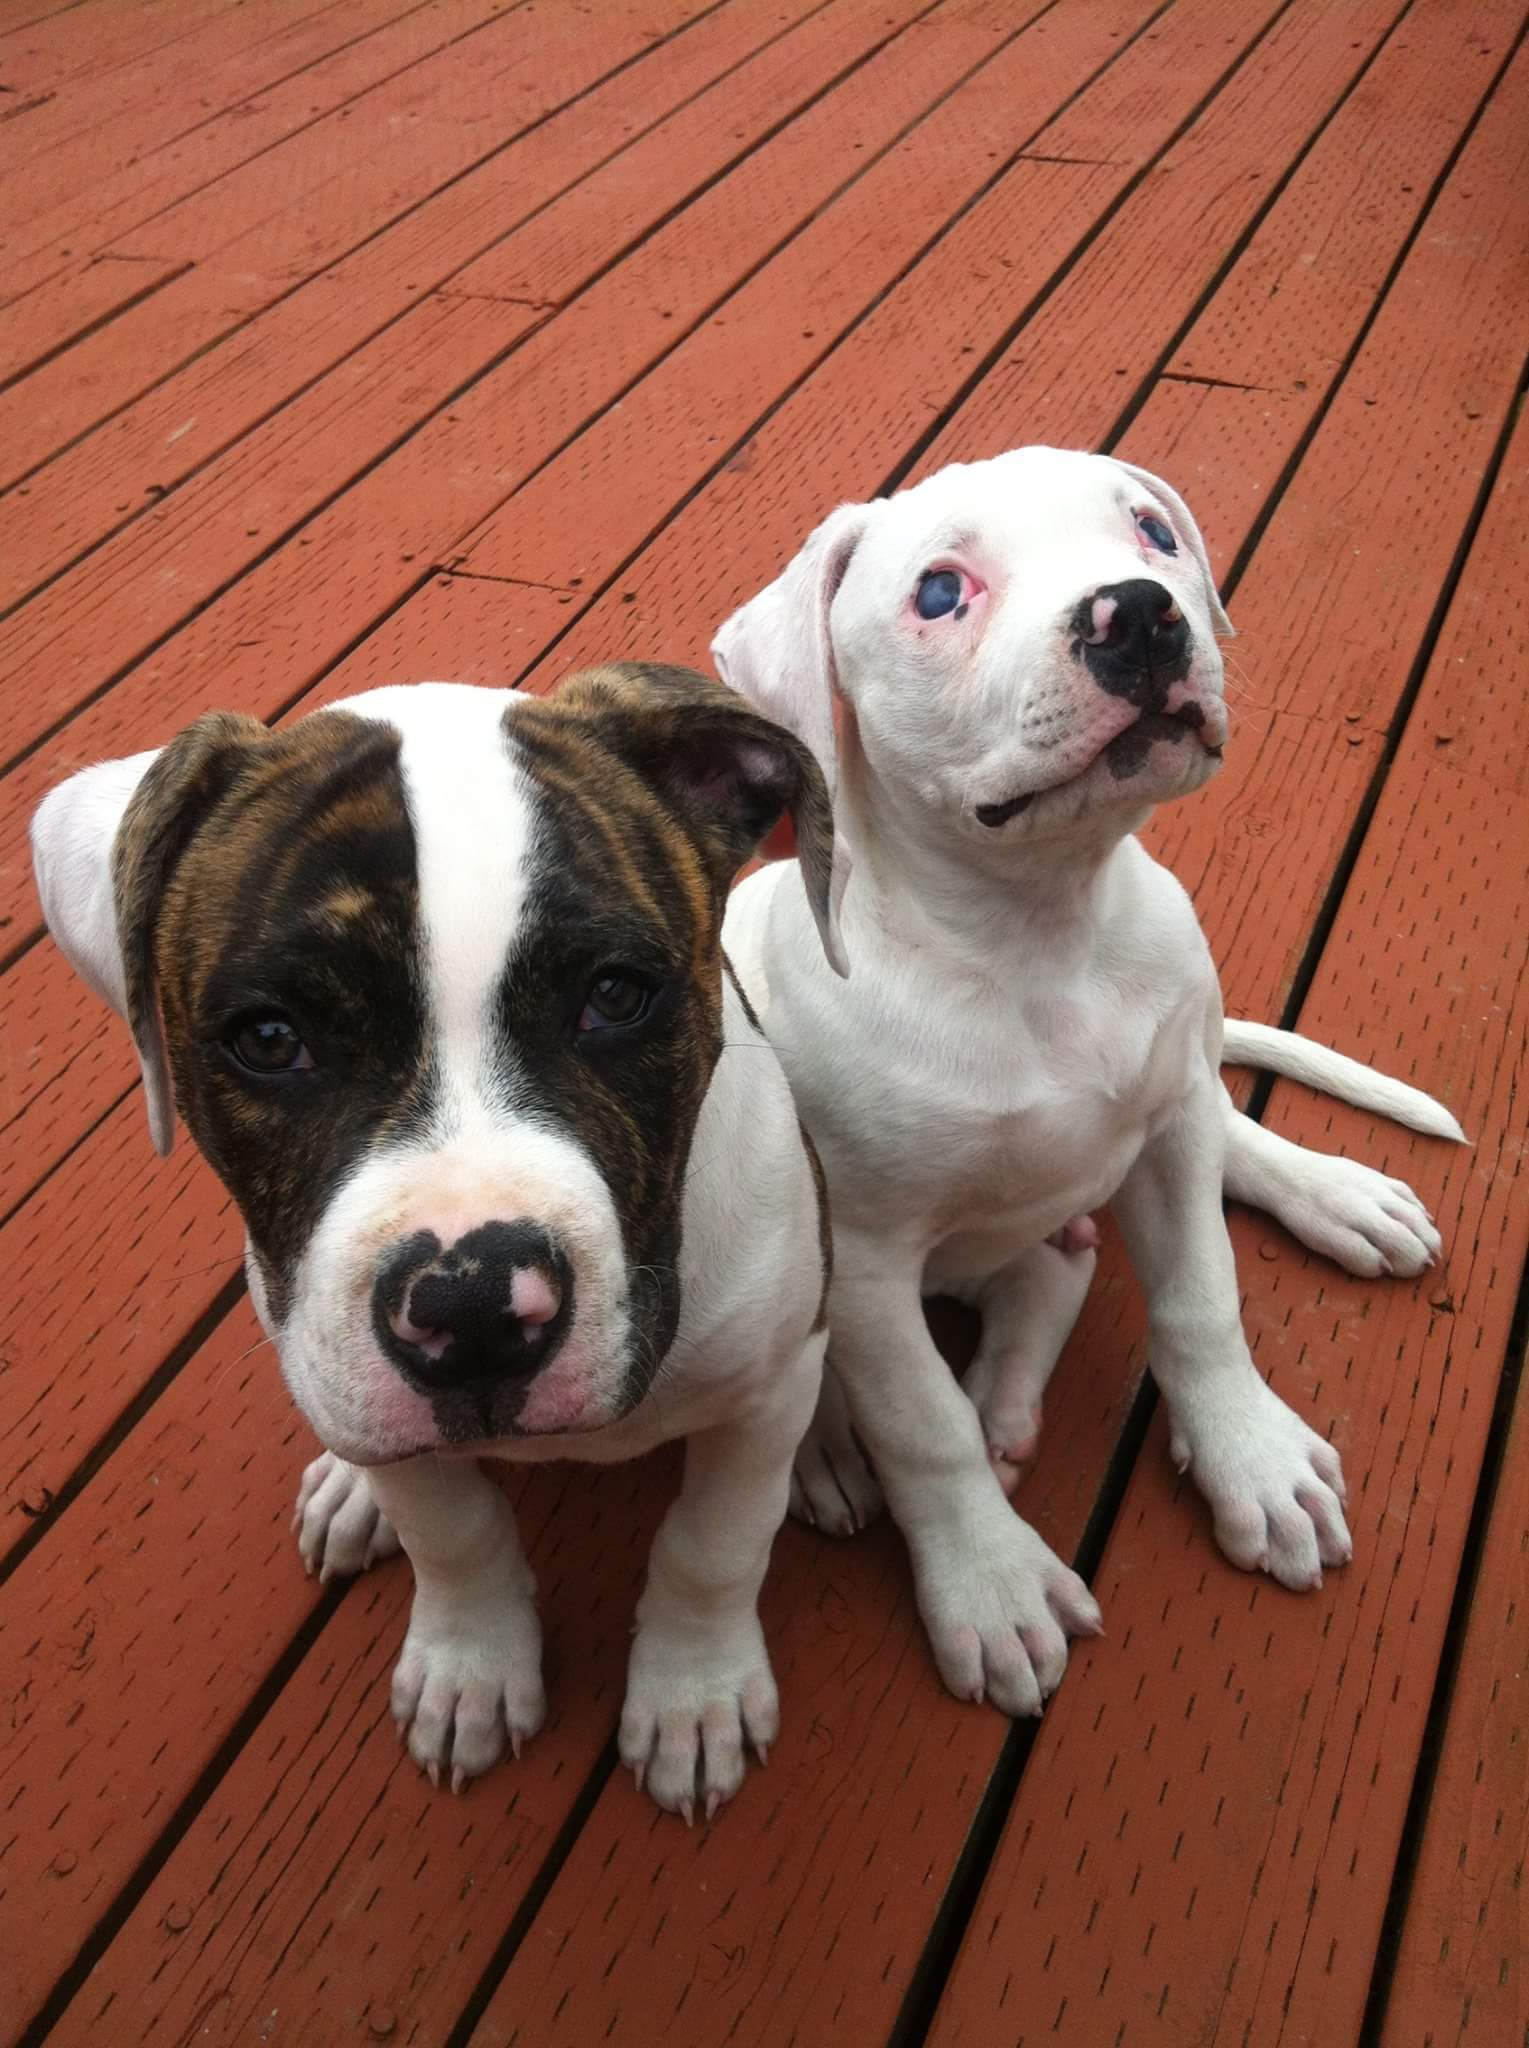 My Johnson American Bulldog puppies; Fenrir and Ivar